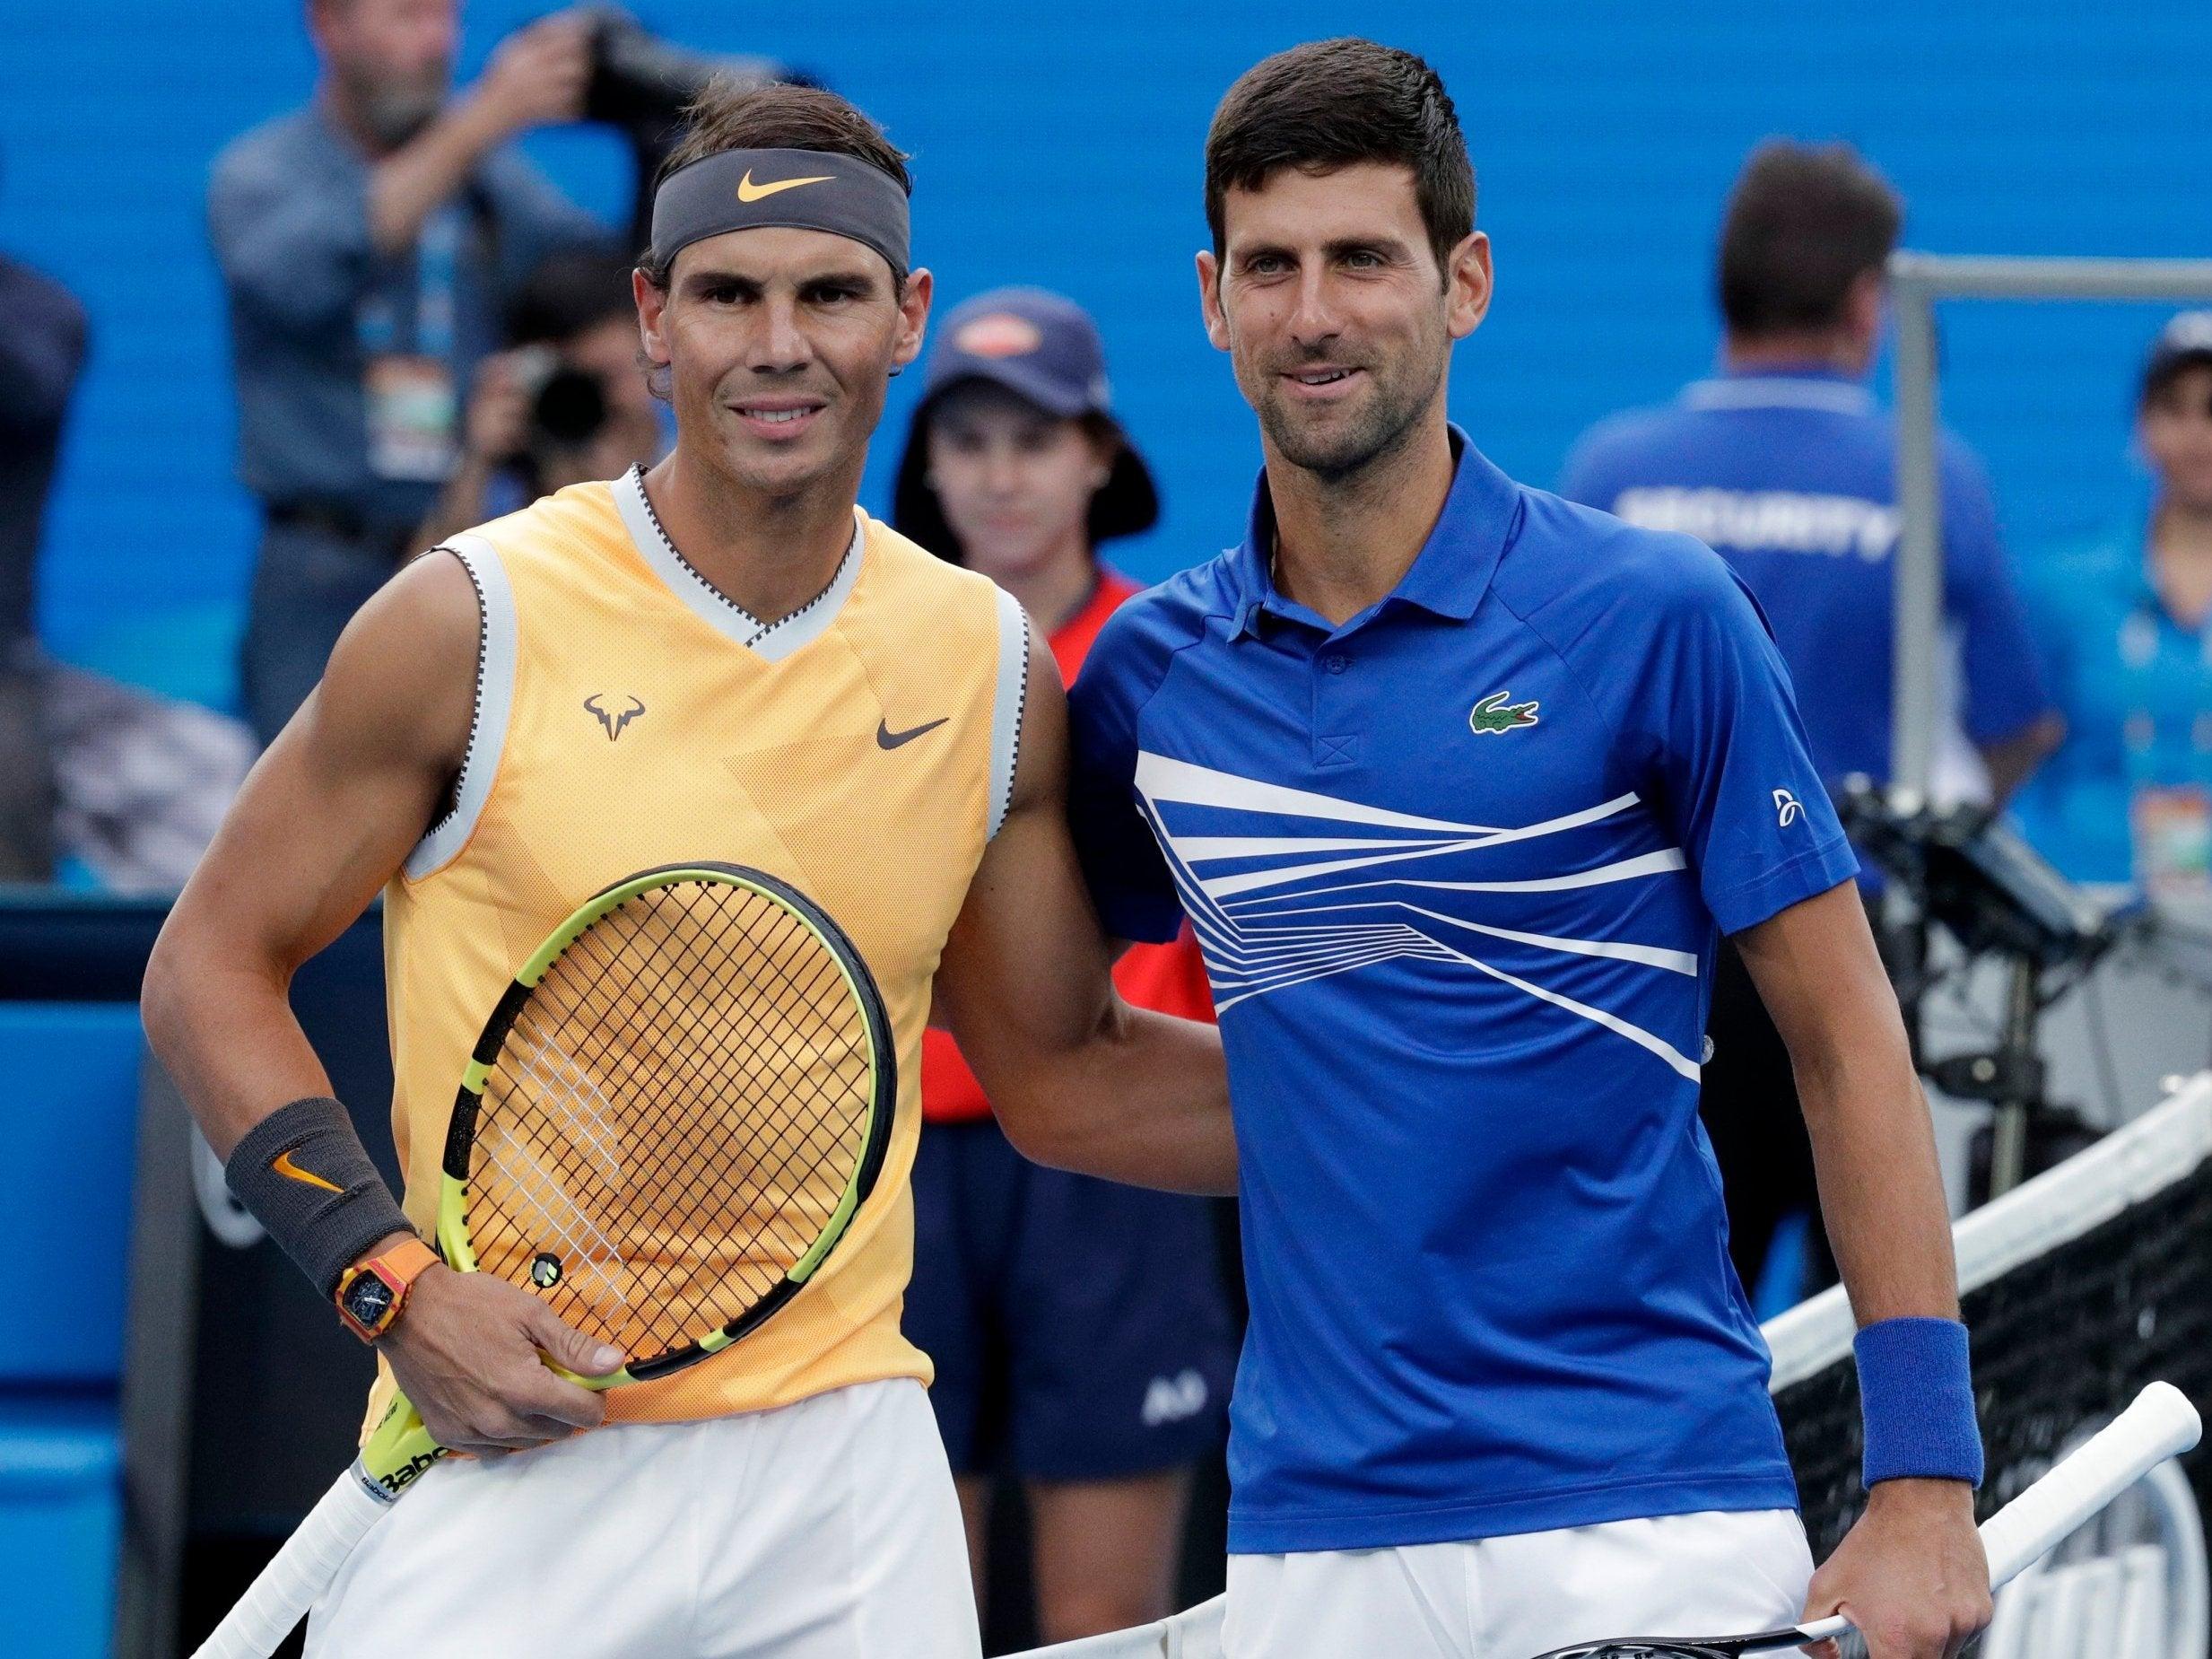 Rafael Nadal and Novak Djokovic during Australian Open 2019